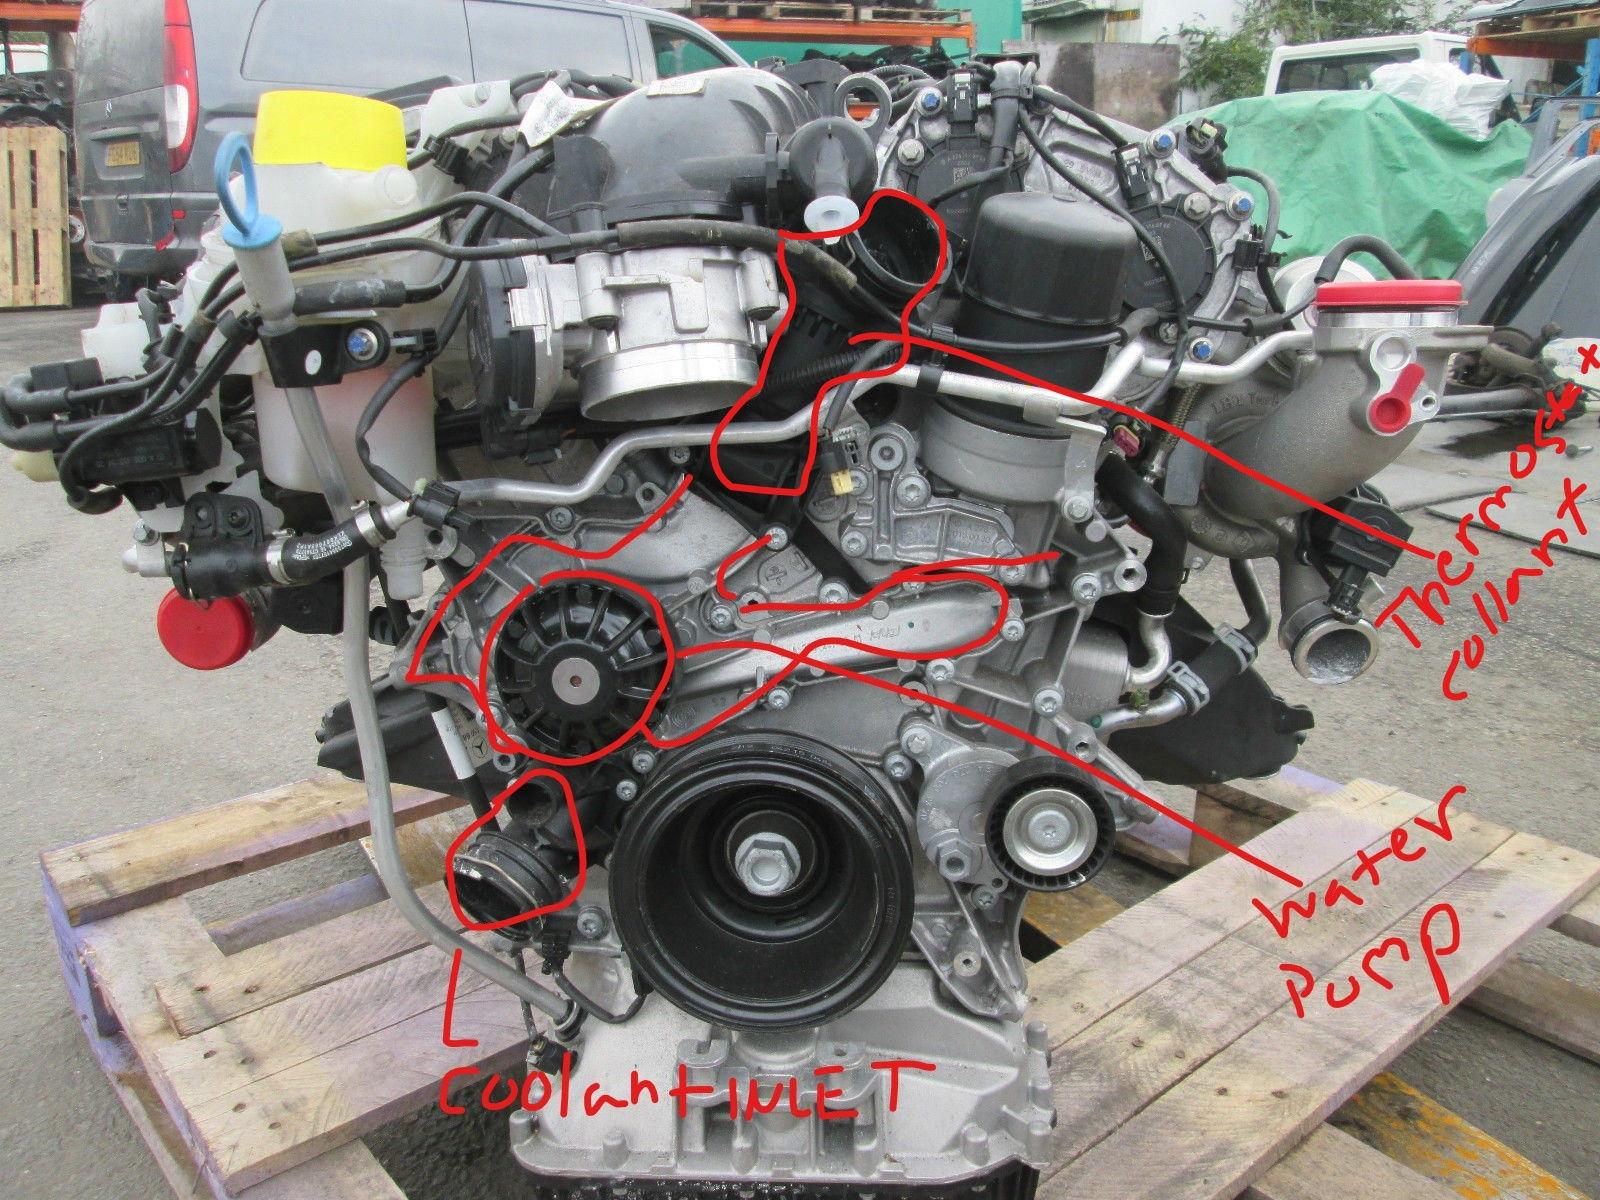 Magnificent Parts Of A Car Engine Labeled Photos | Jzgreentown.com